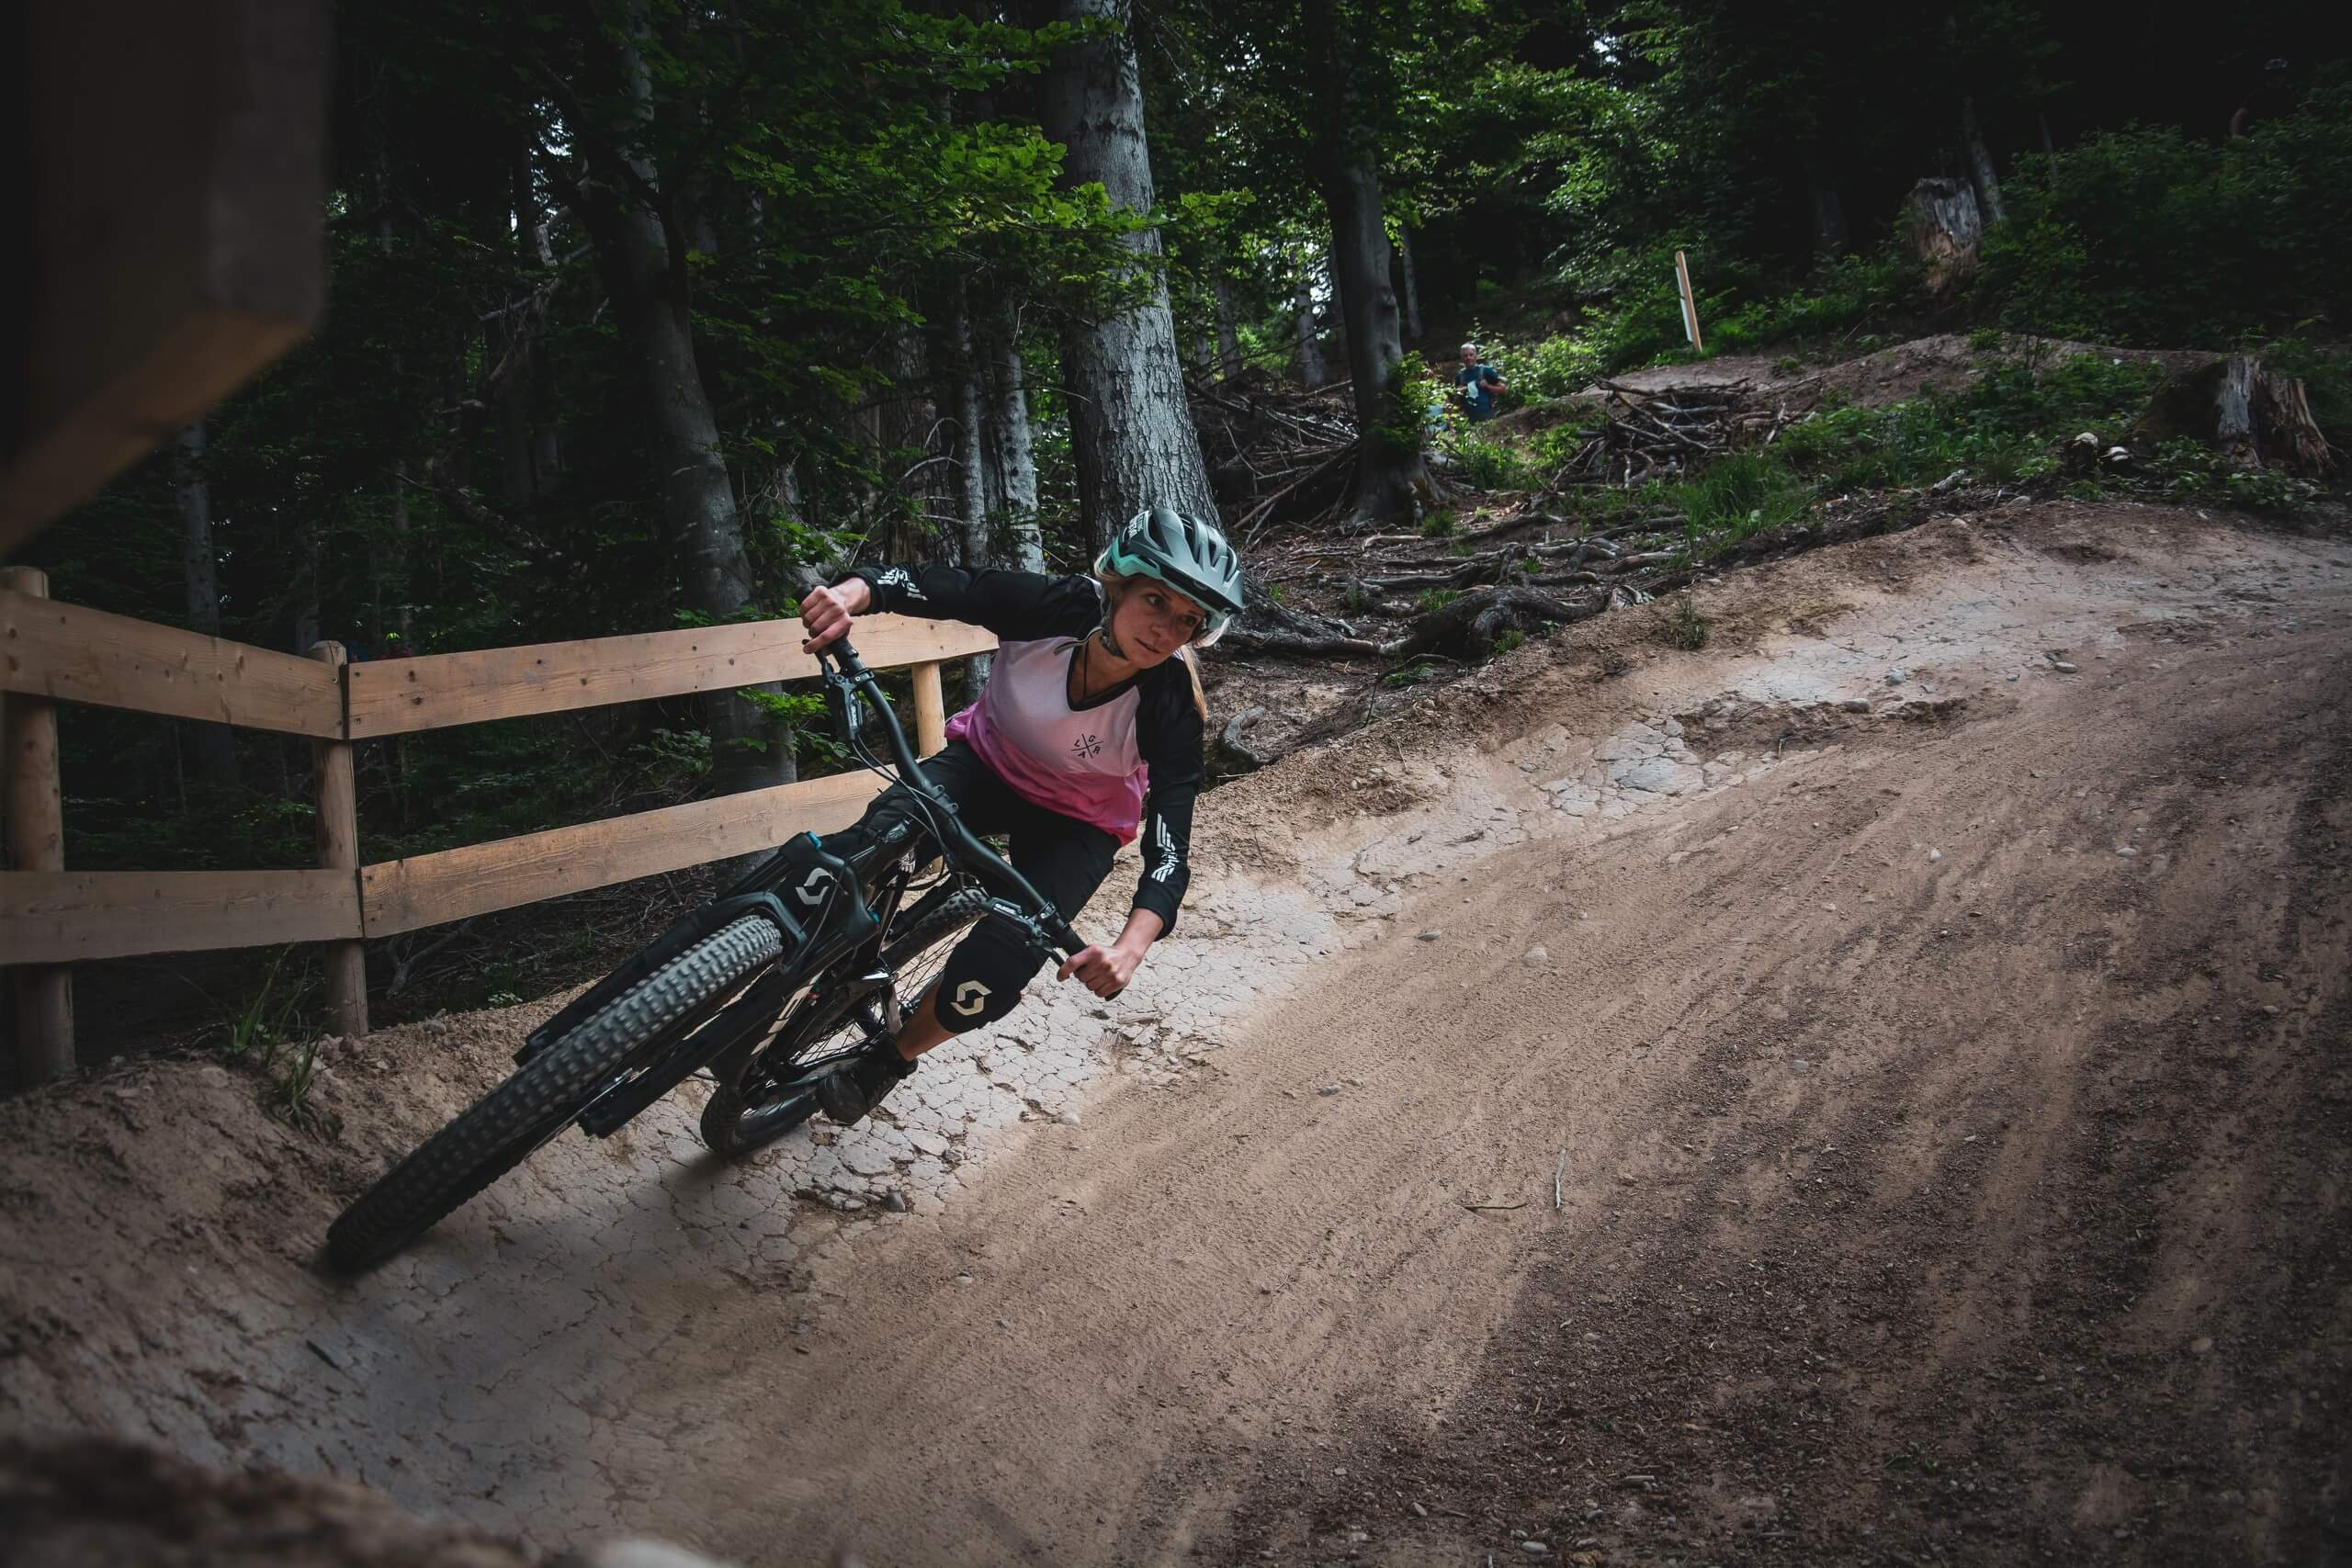 bikepark-thunersee-downhill-wald-kurve-zaun